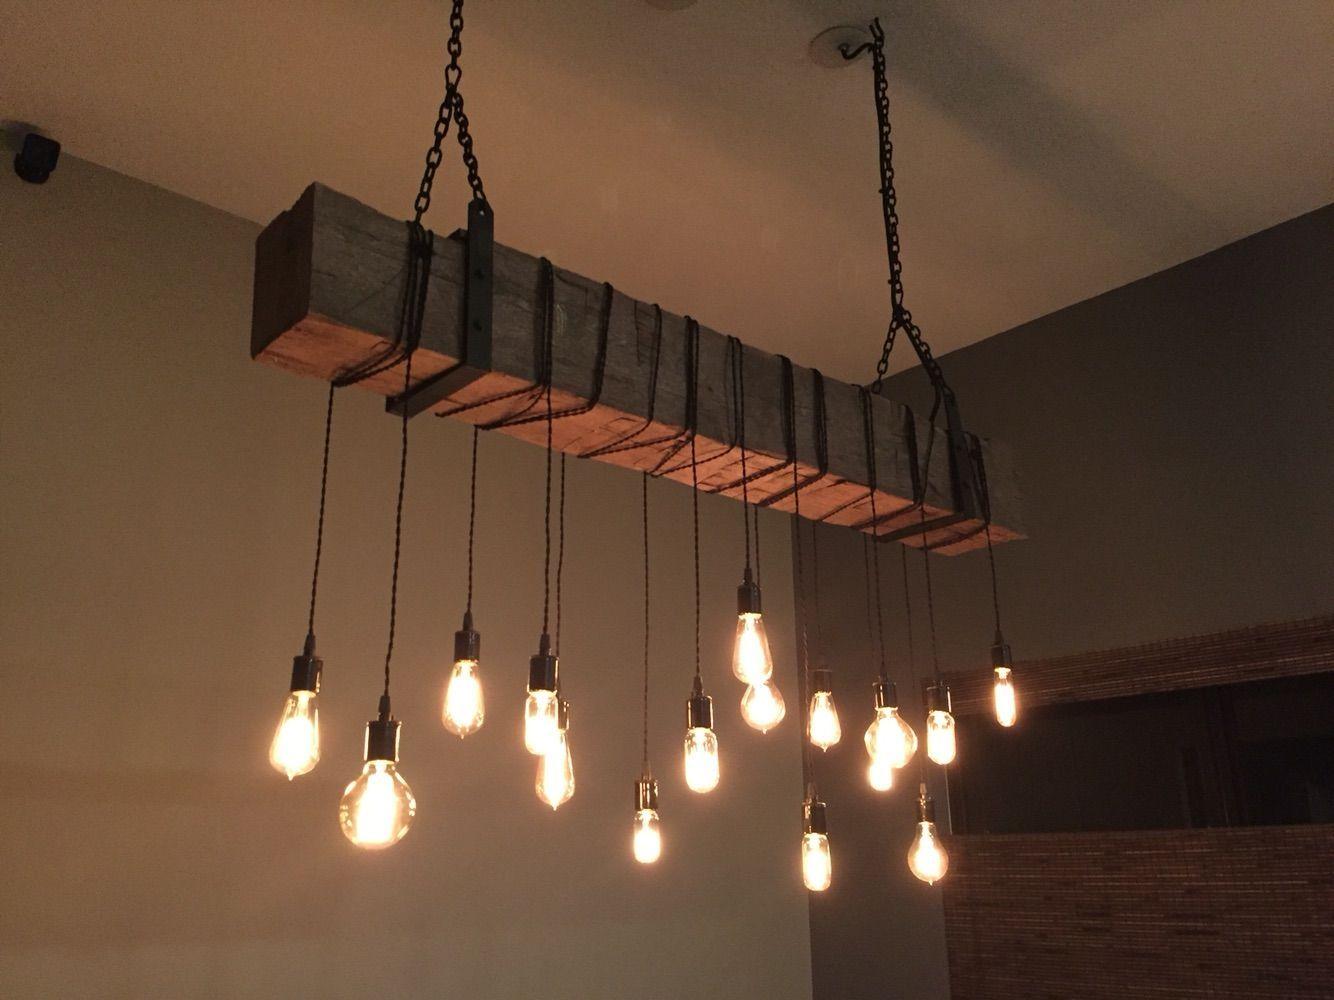 Custom Made Reclaimed Barn Beam Chandelier Light Fixture Modern Rustic Lighting